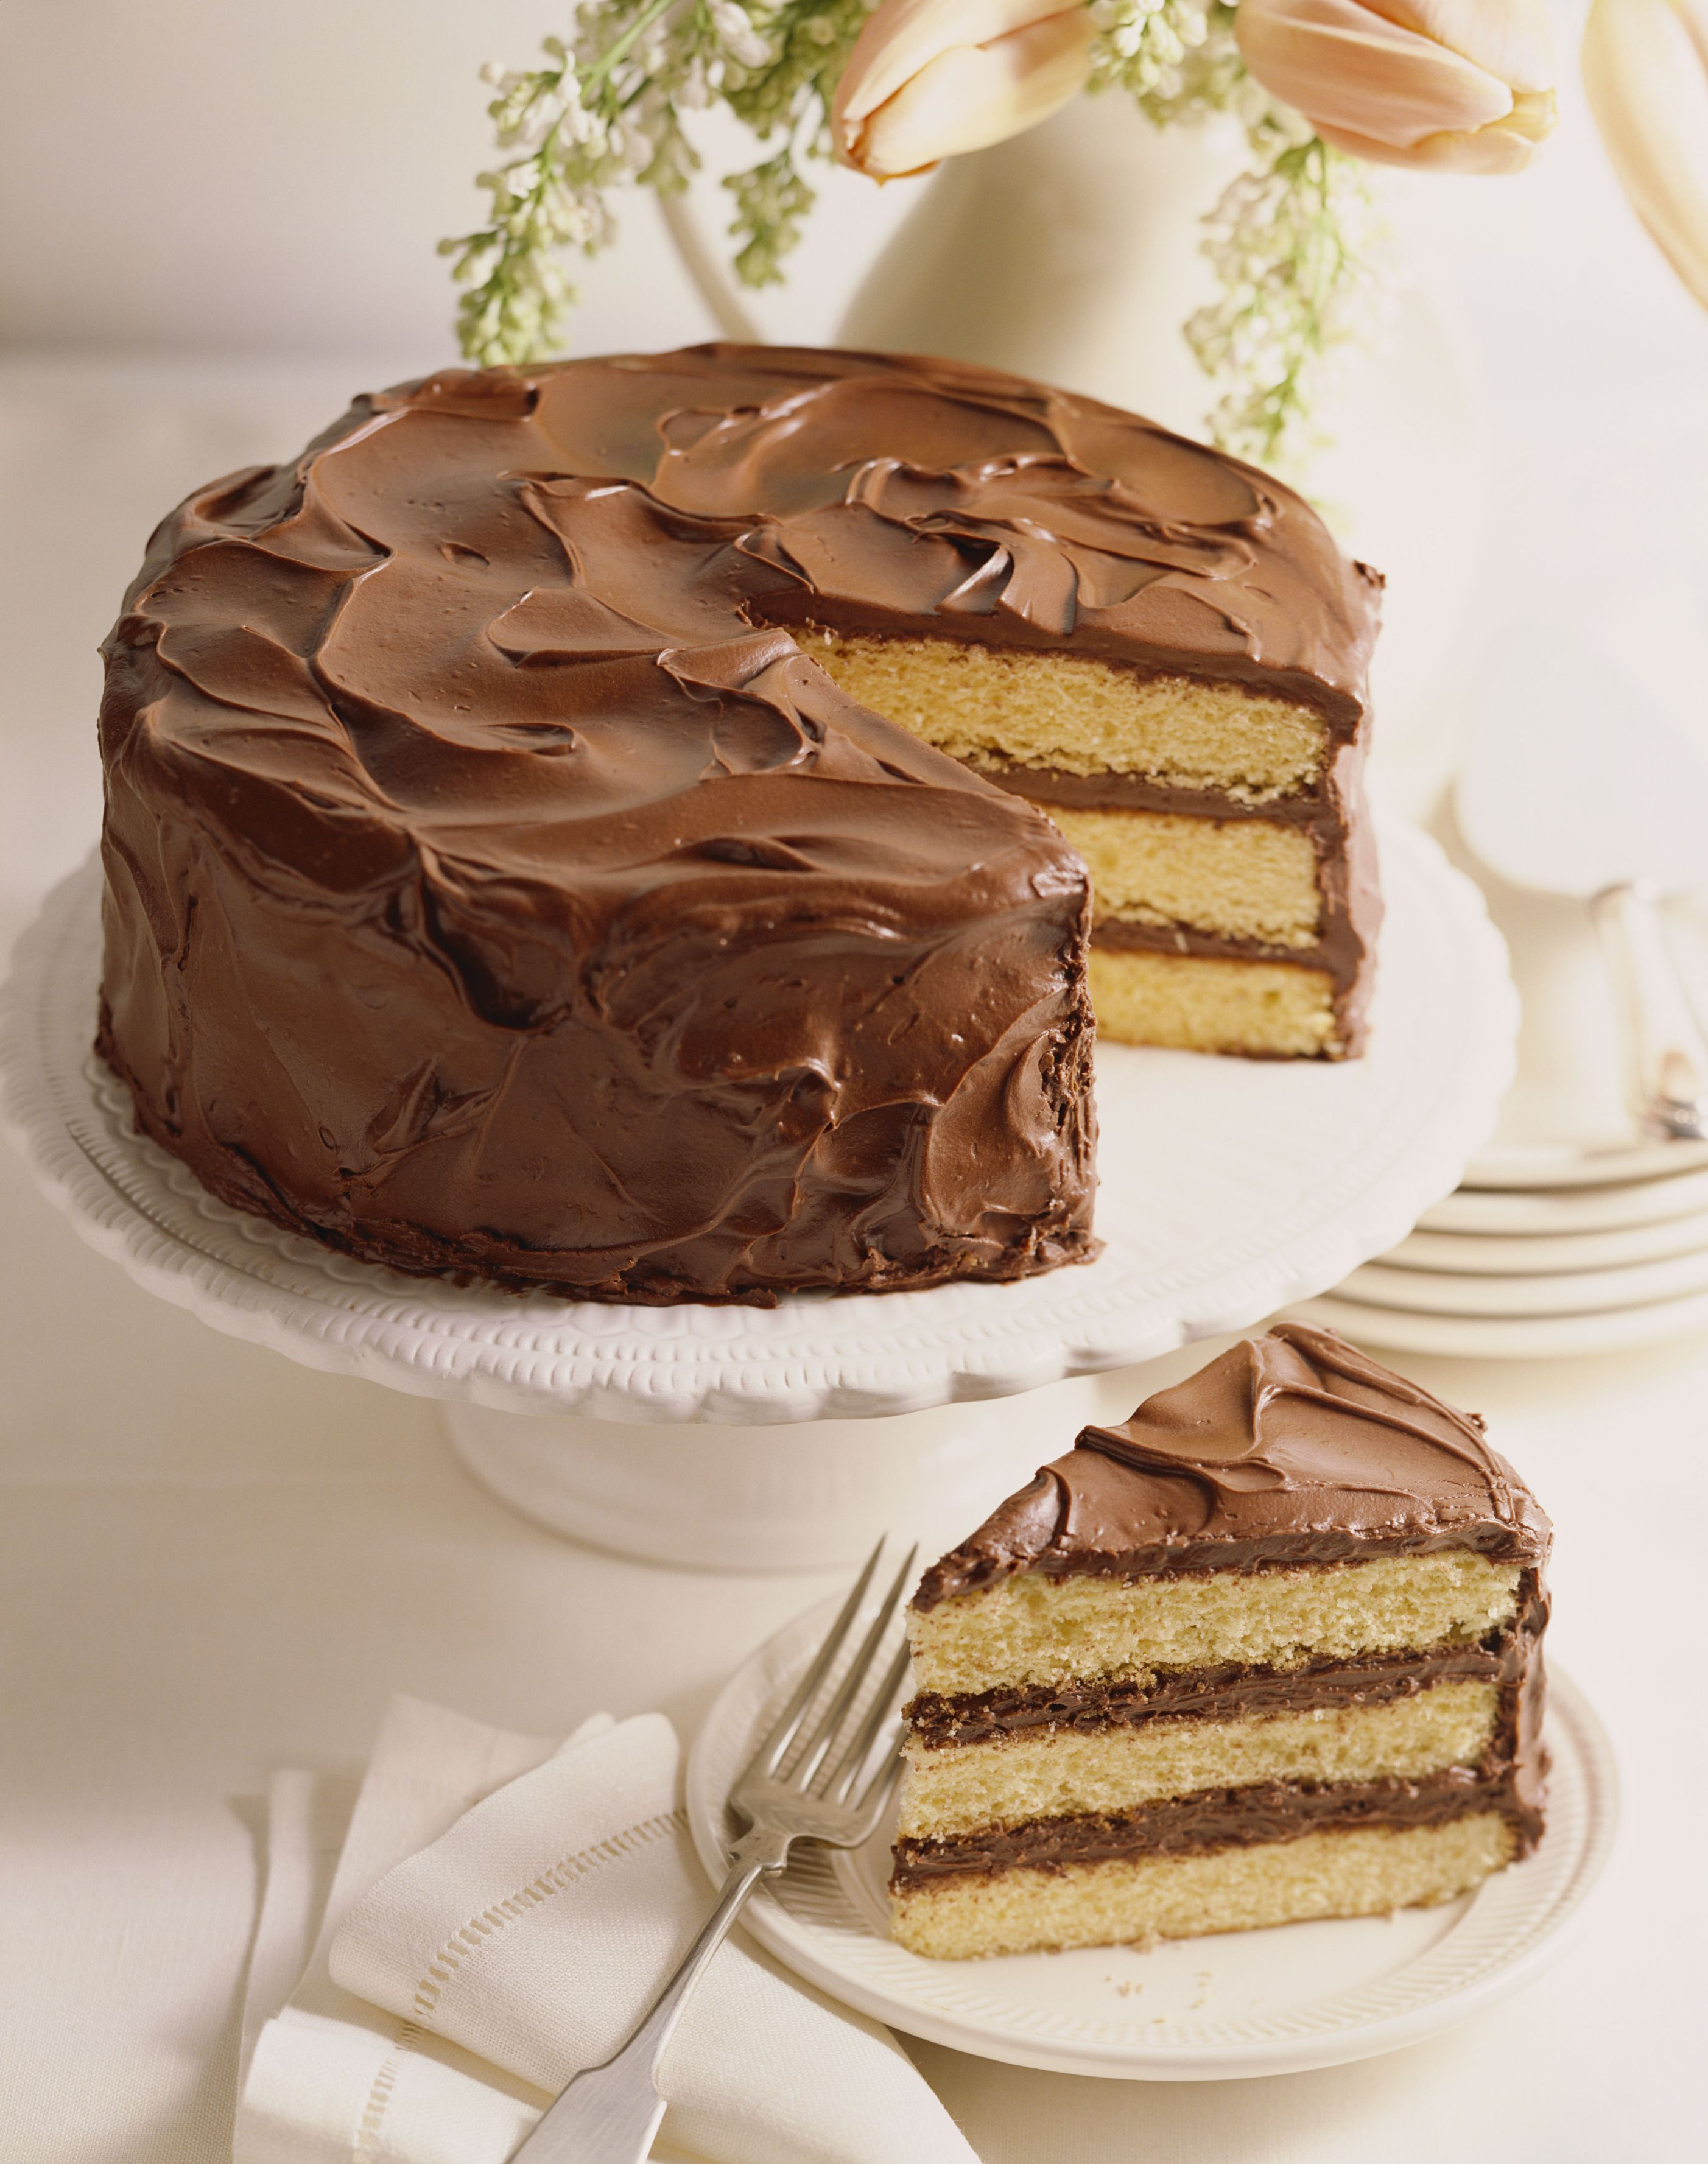 24 Homemade Birthday Cake Ideas